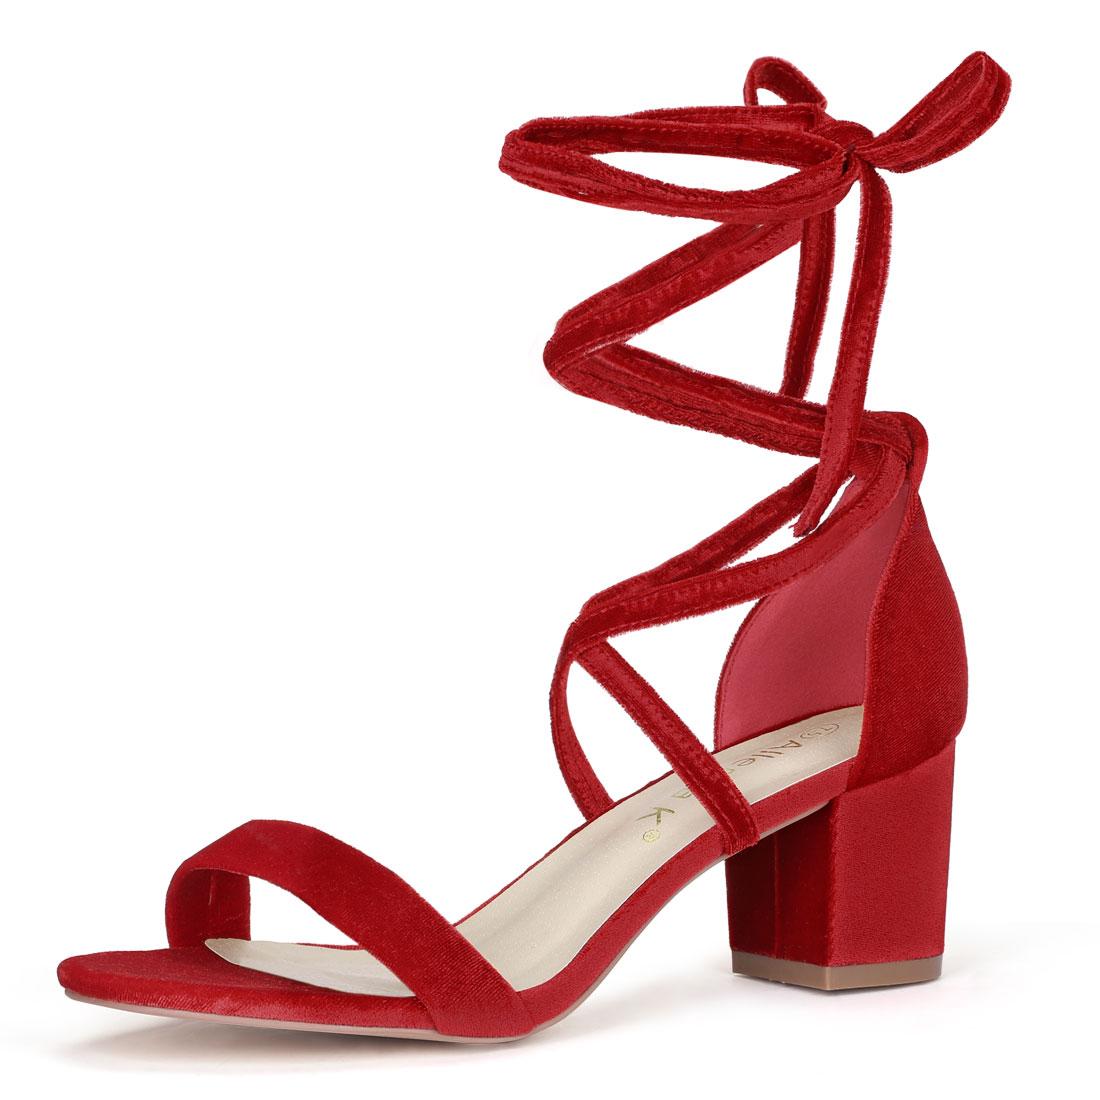 Allegra K Women Open Toe Lace Up Mid Chunky Heeled Sandals Red-velvet 9 M US